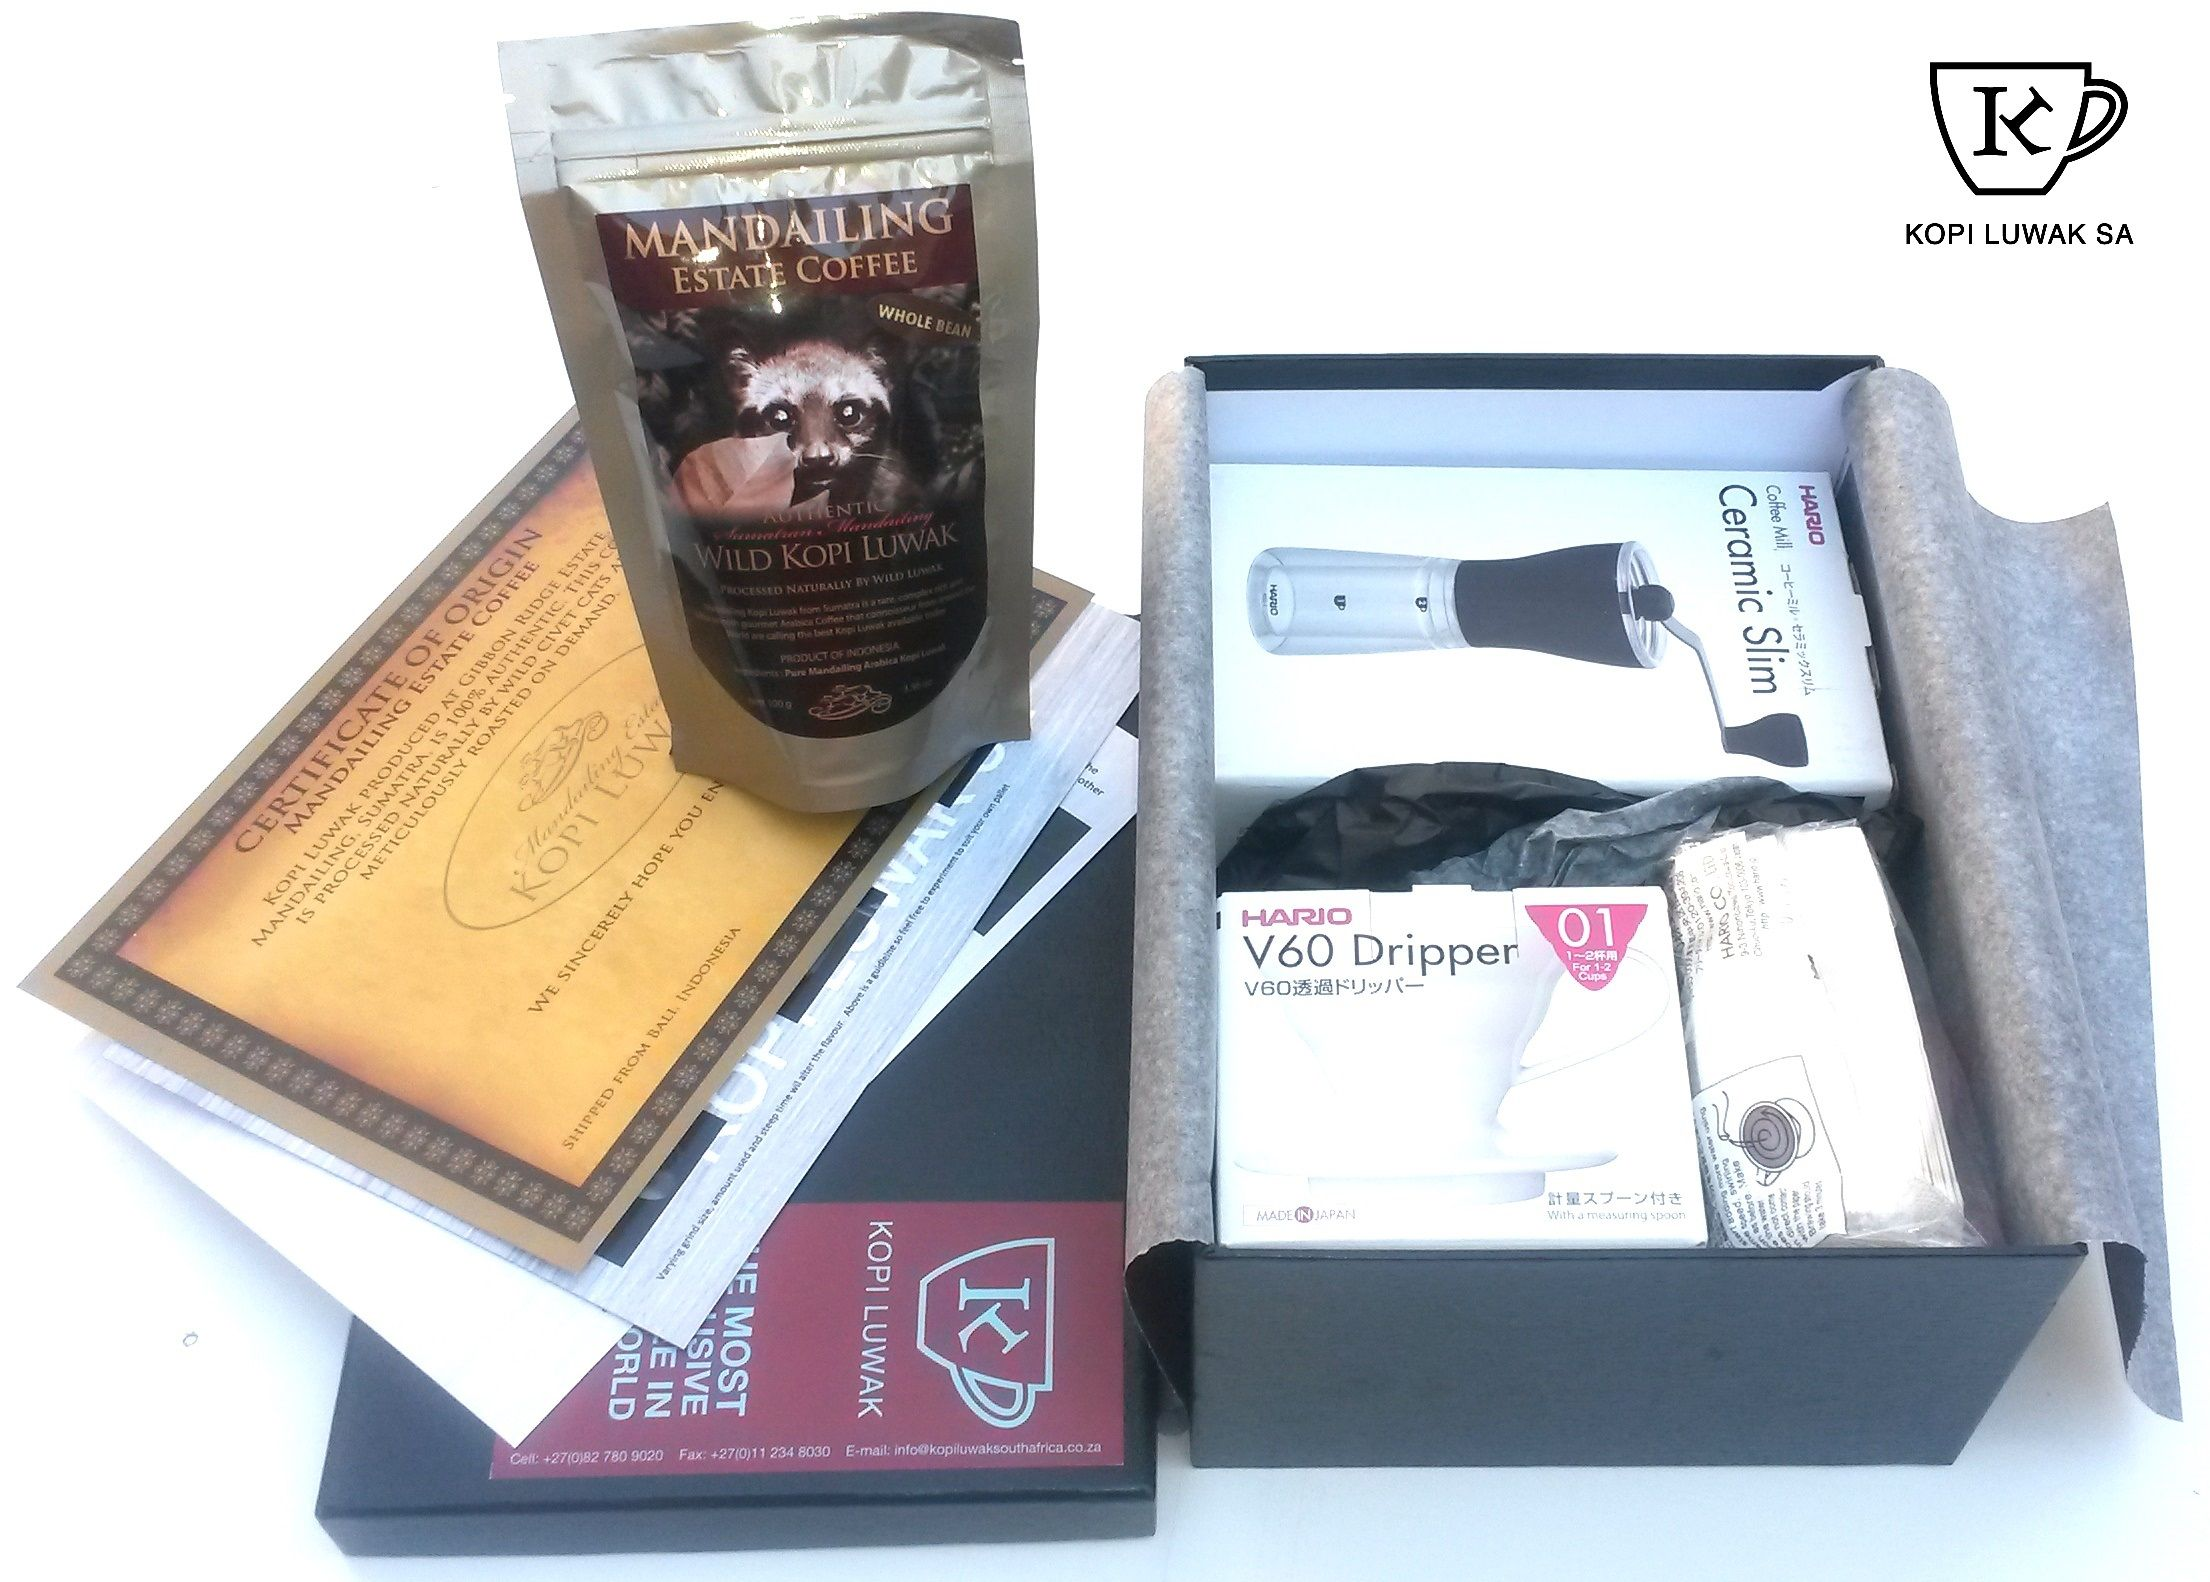 Hario & Wild Kopi Luwak Gift Box Tea bottle, Hario, Kopi